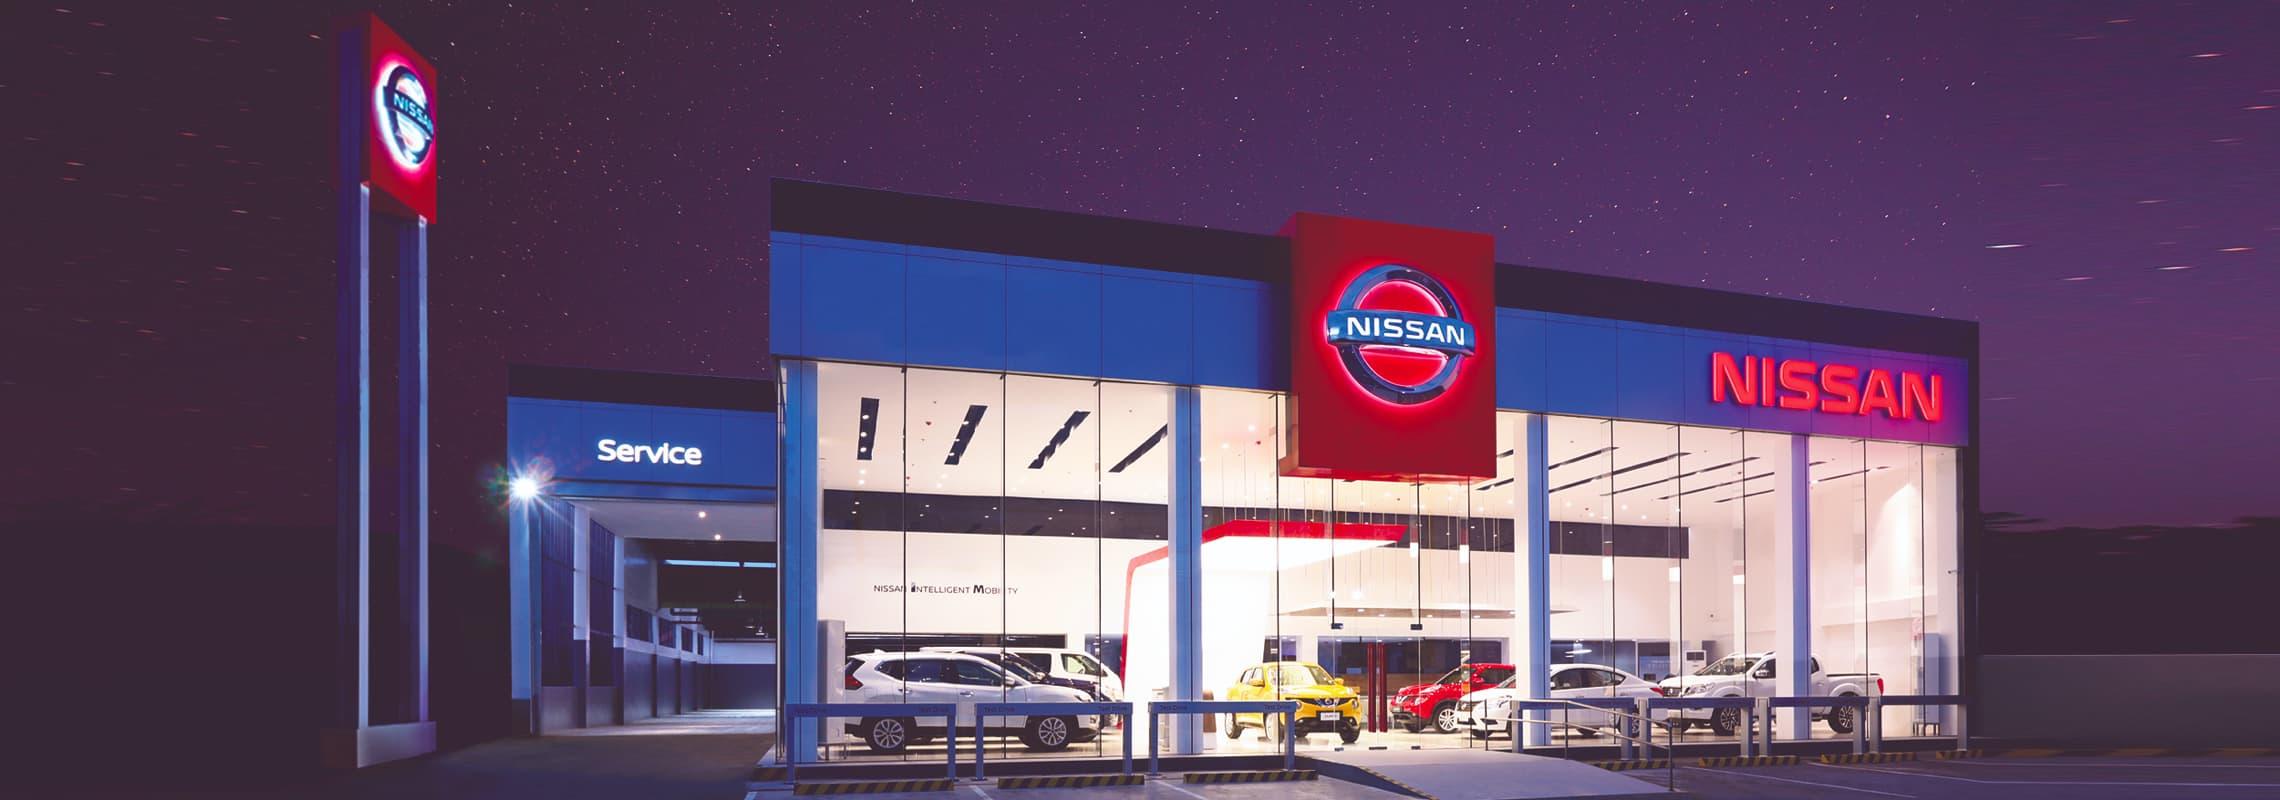 An exterior shot of a Nissan dealership at night